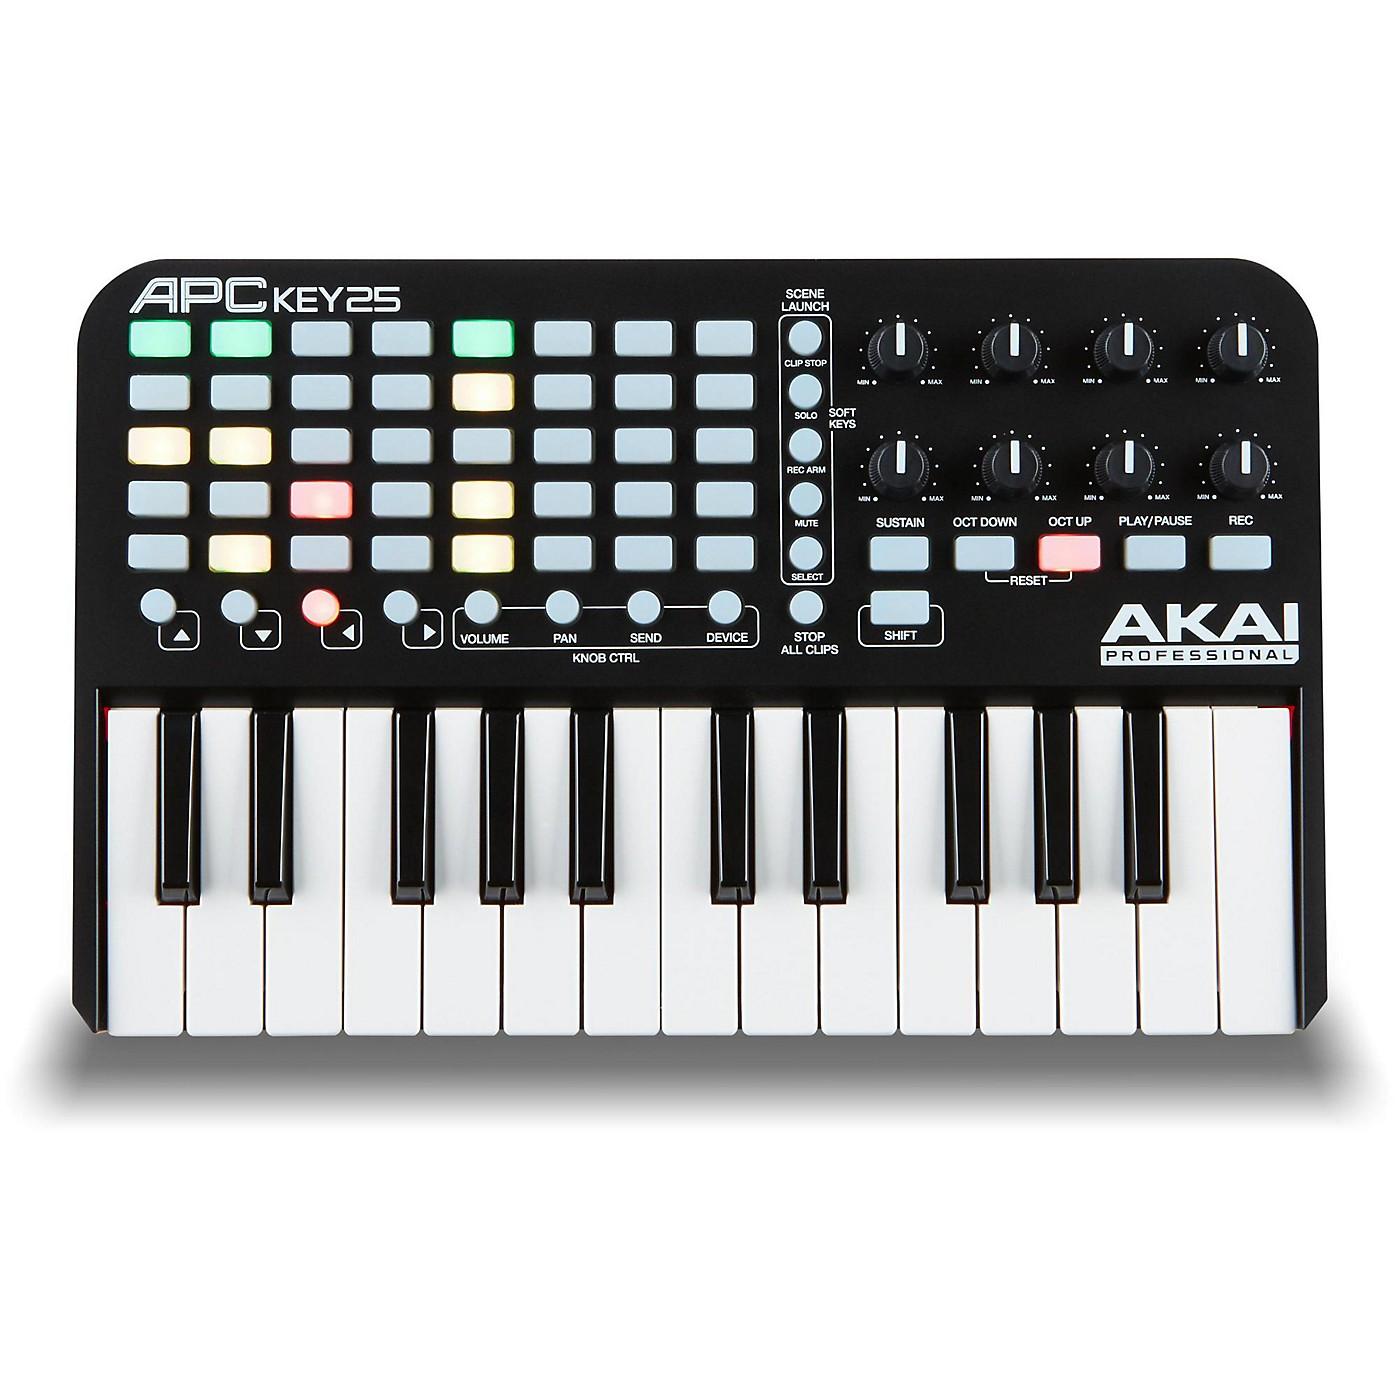 Akai Professional APC KEY 25 Keyboard Controller thumbnail